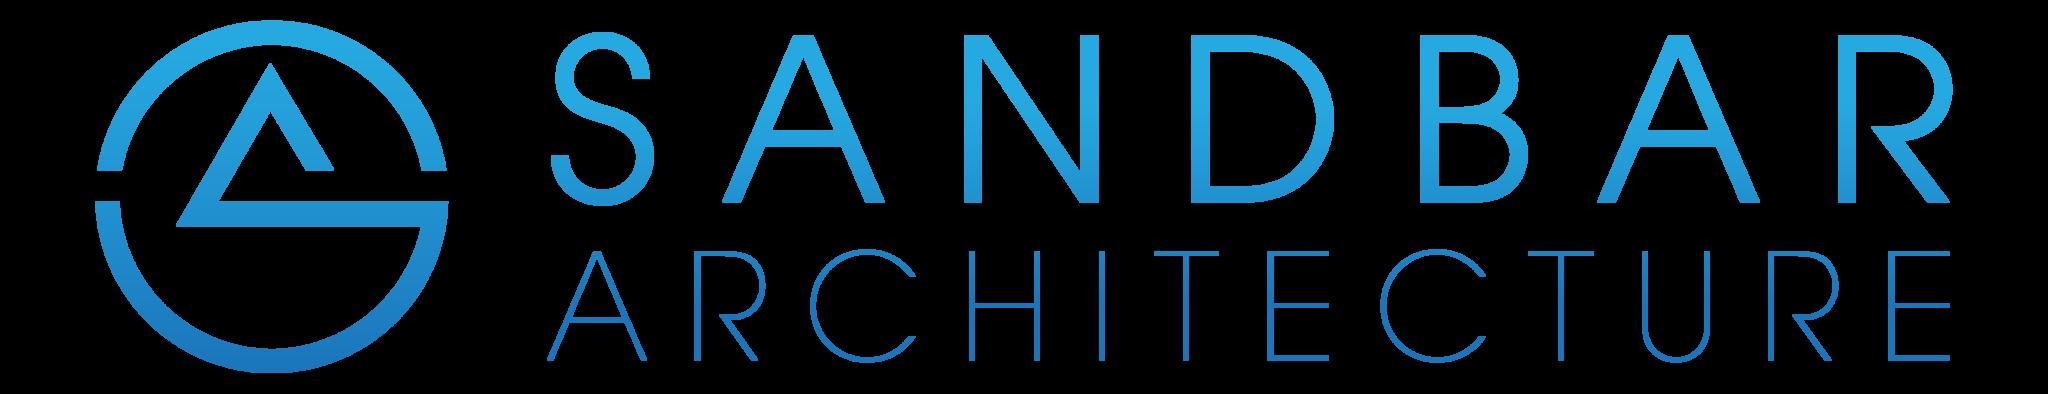 Sandbar Architecture